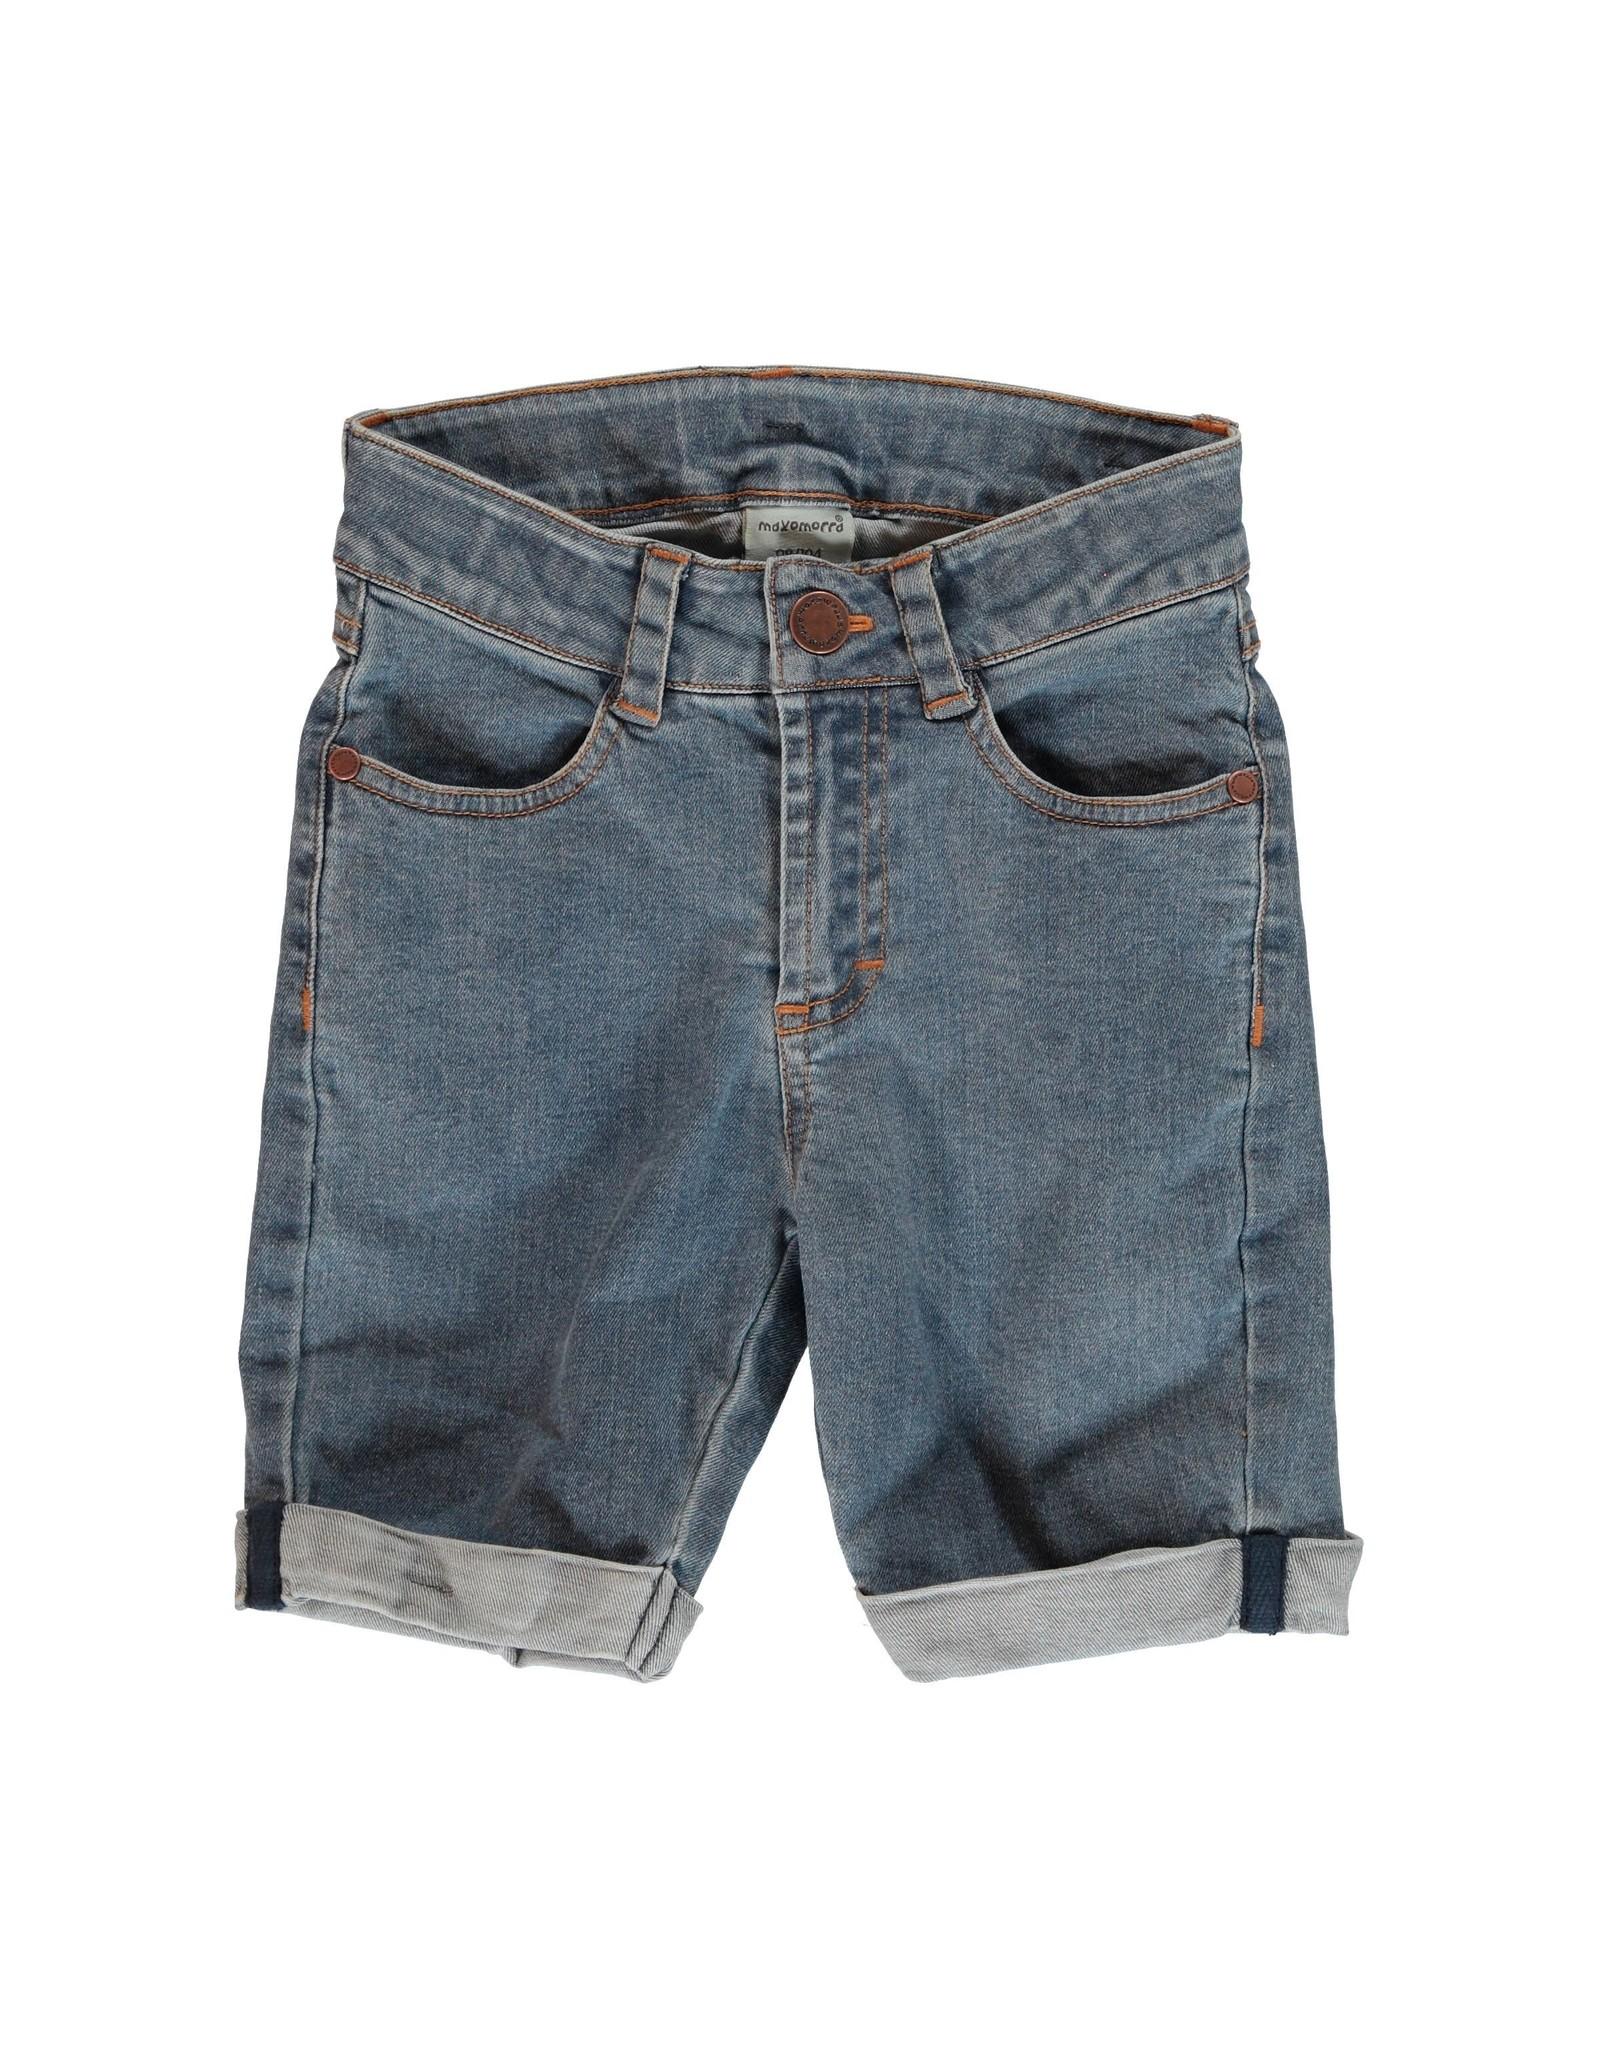 Maxomorra Maxomorra  Denim Shorts